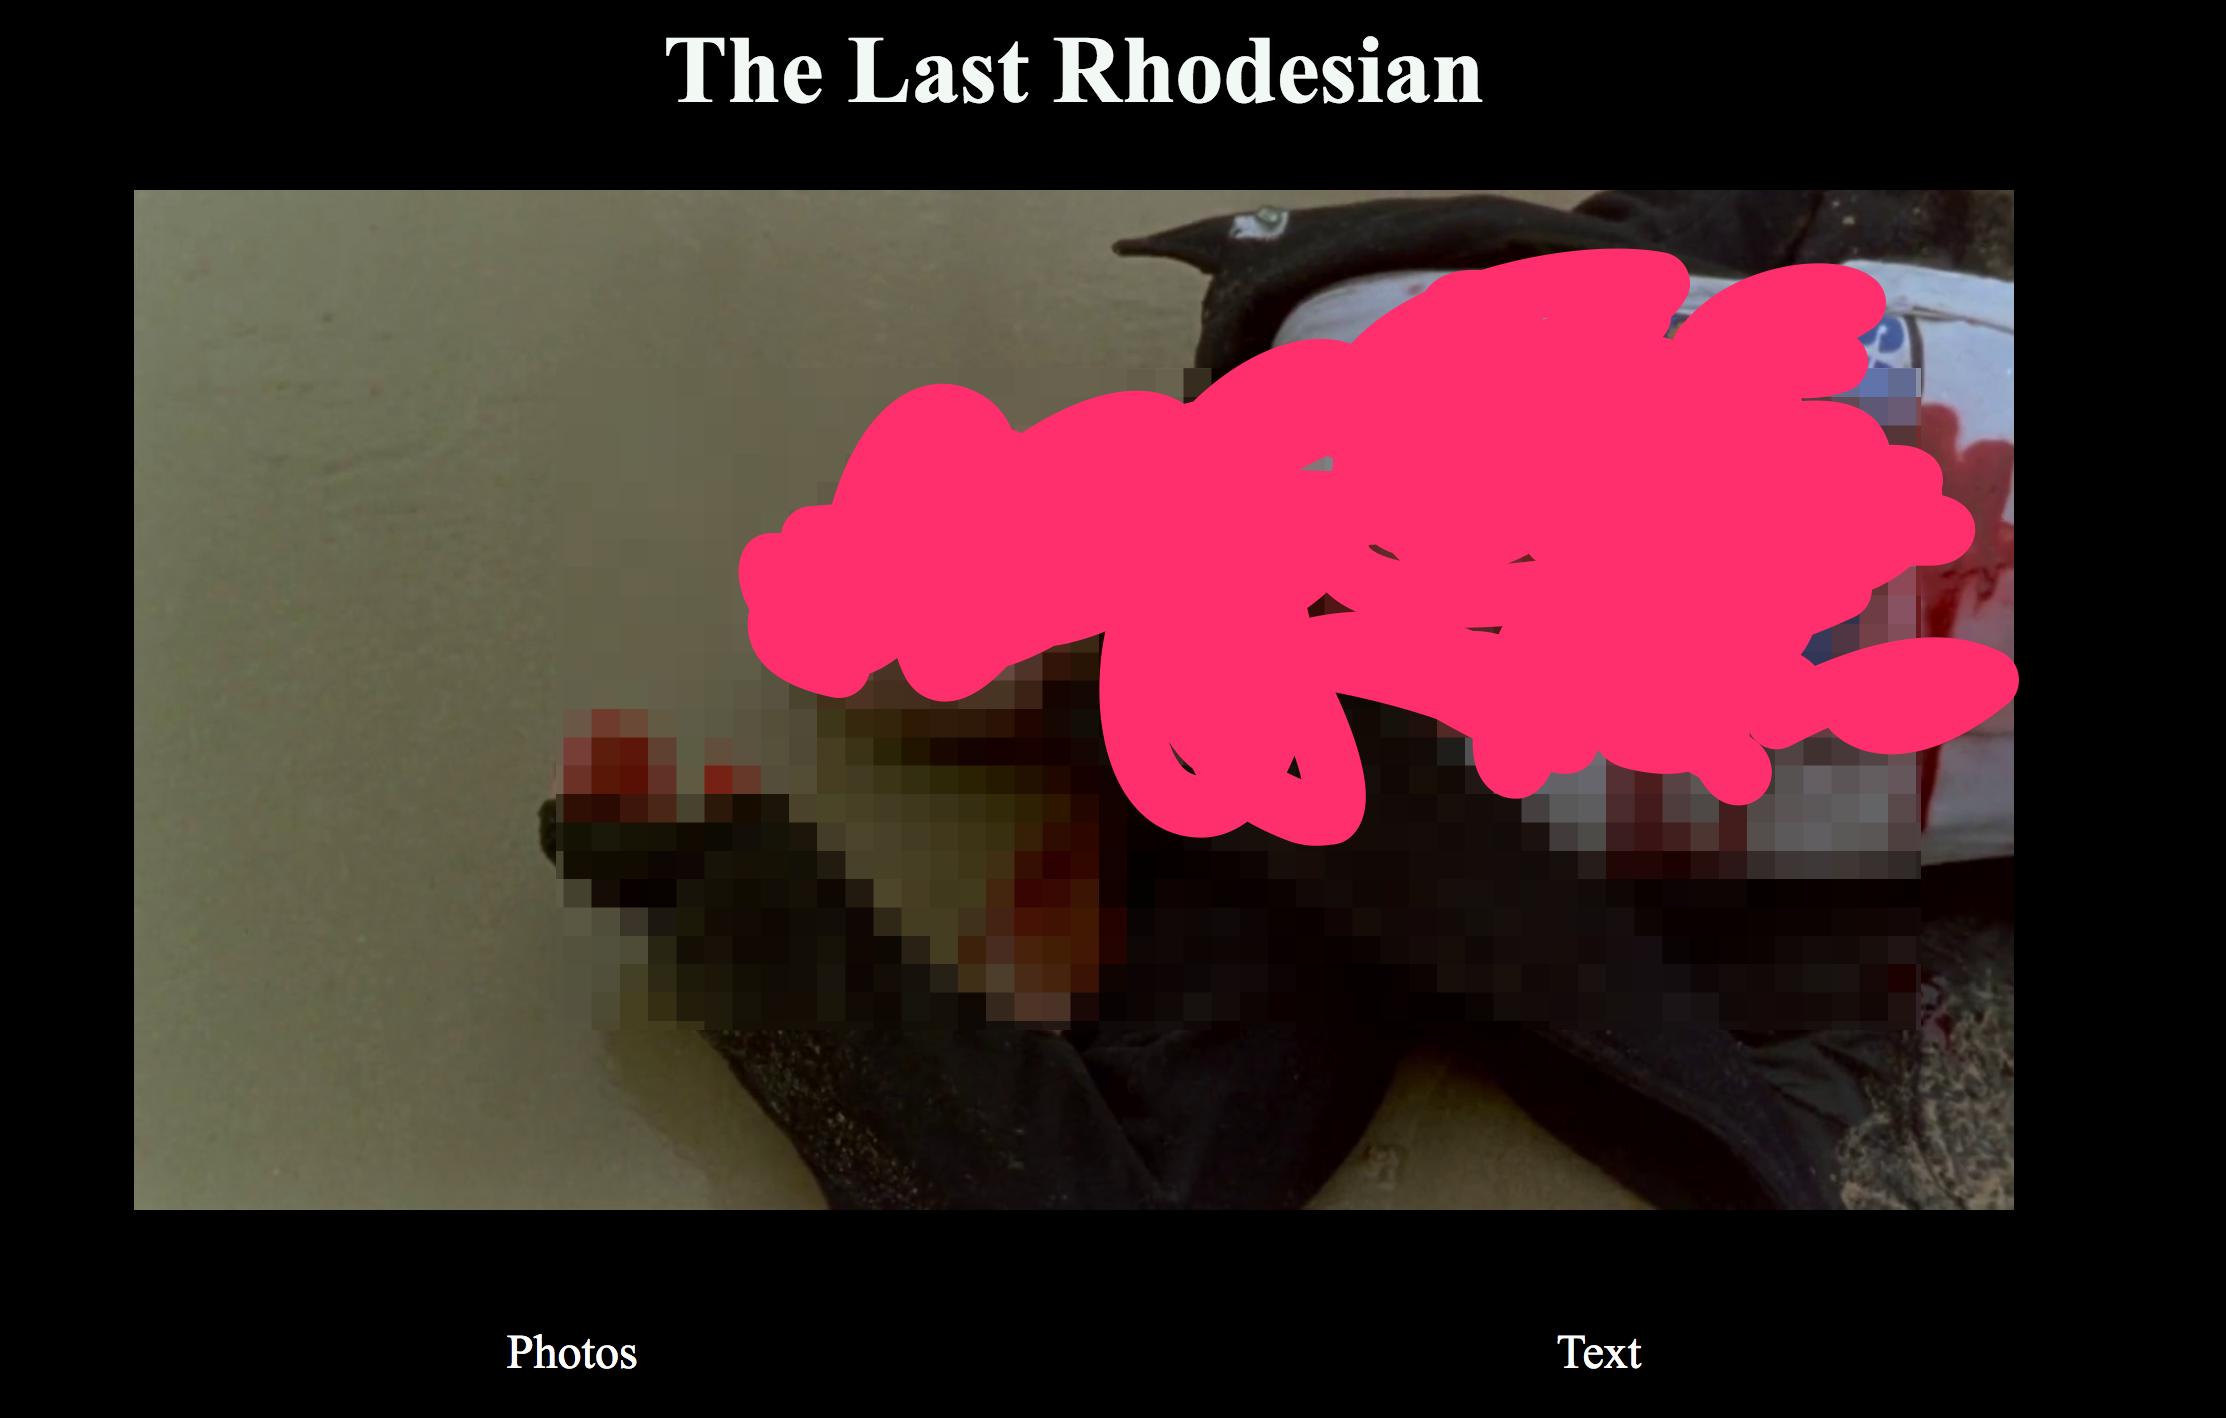 The Last Rhodesian